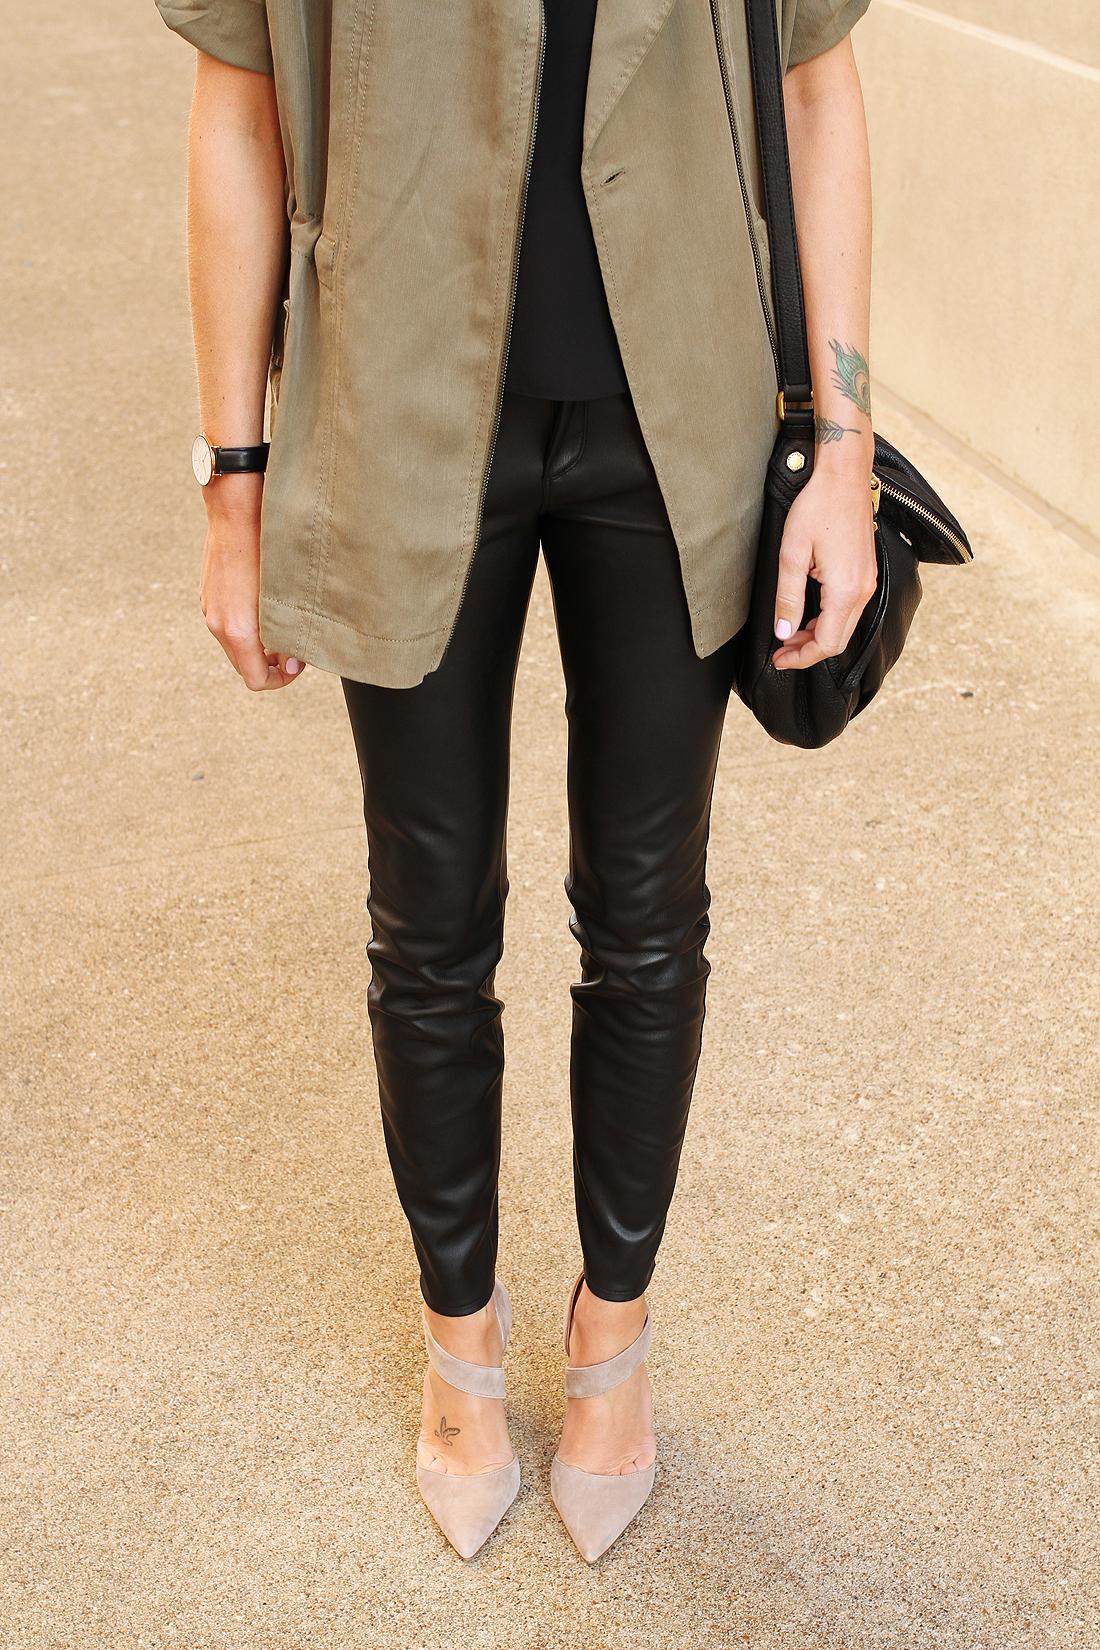 fashion-jackson-vince-camuto-carlotte-pumps-banana-republic-drapey-drawstring-jacket-black-faux-leather-pants